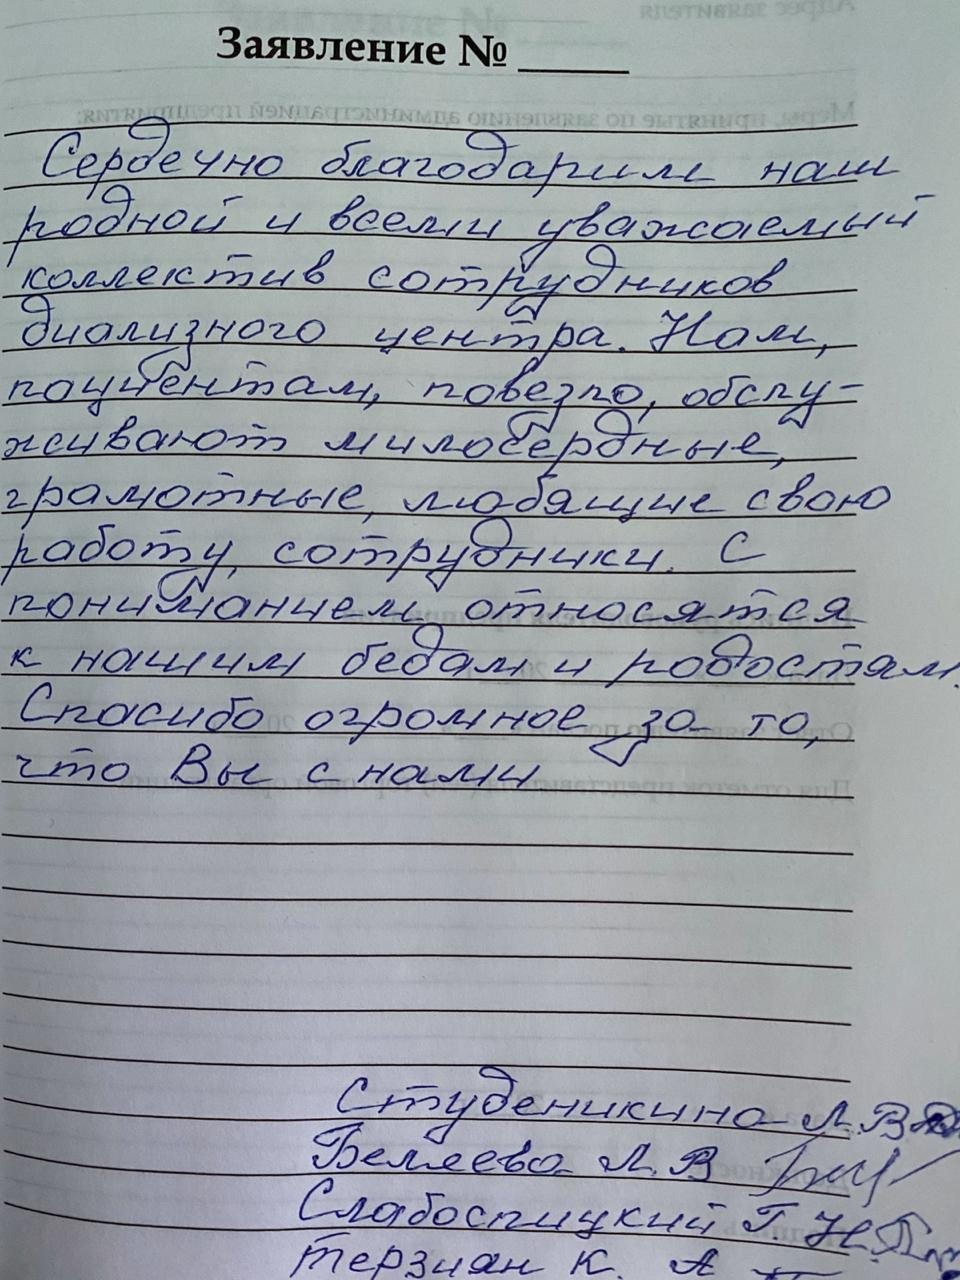 Студеникина Л.В, Беляева Л.В, Слабоспицкин Г.Н, Терзиян К.А